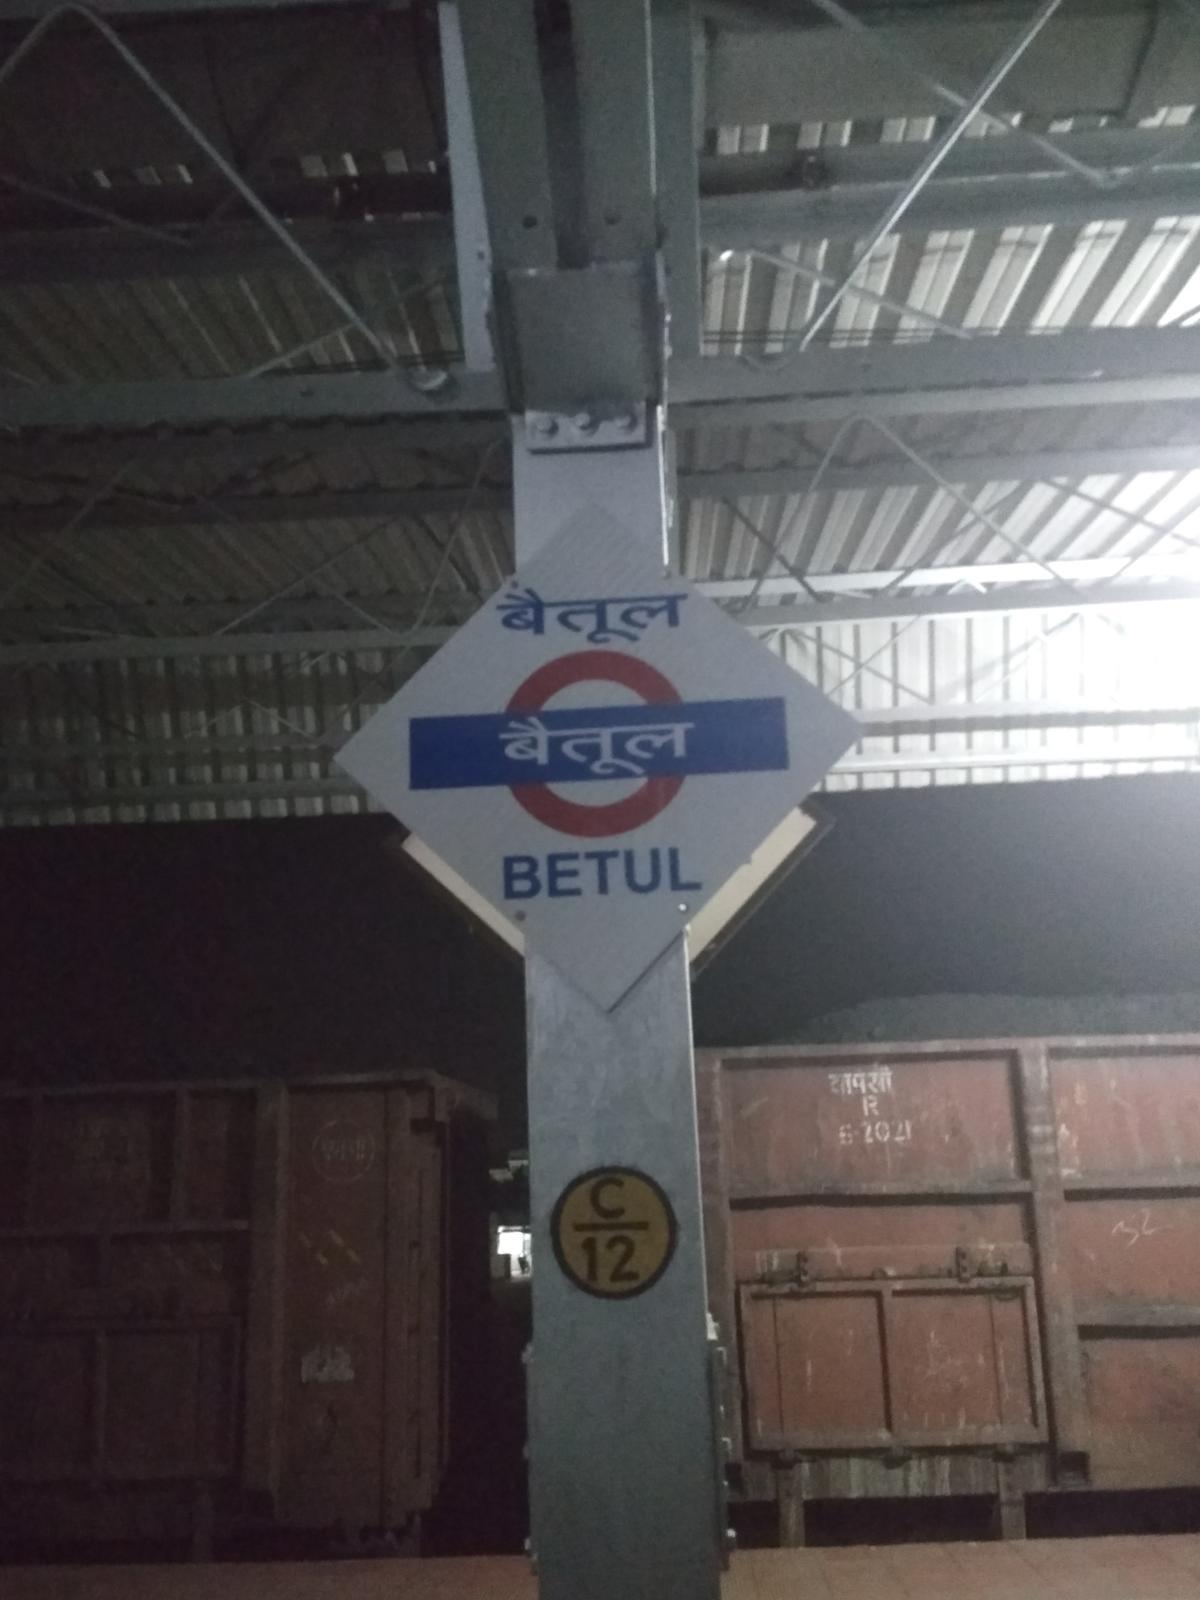 Bhandarkund to betul train live status